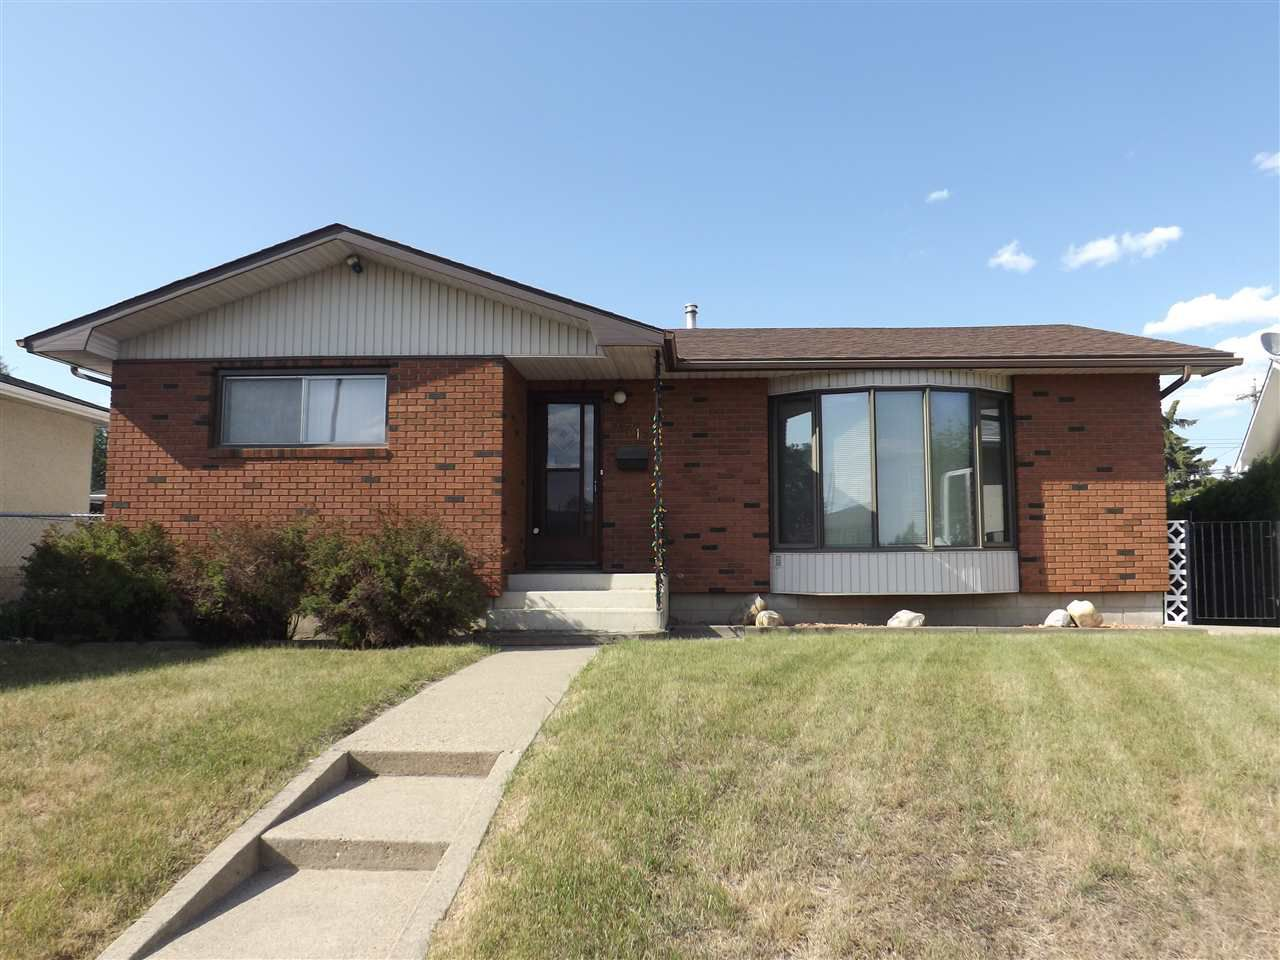 Main Photo: 6712 136 Avenue in Edmonton: Zone 02 House for sale : MLS®# E4145726